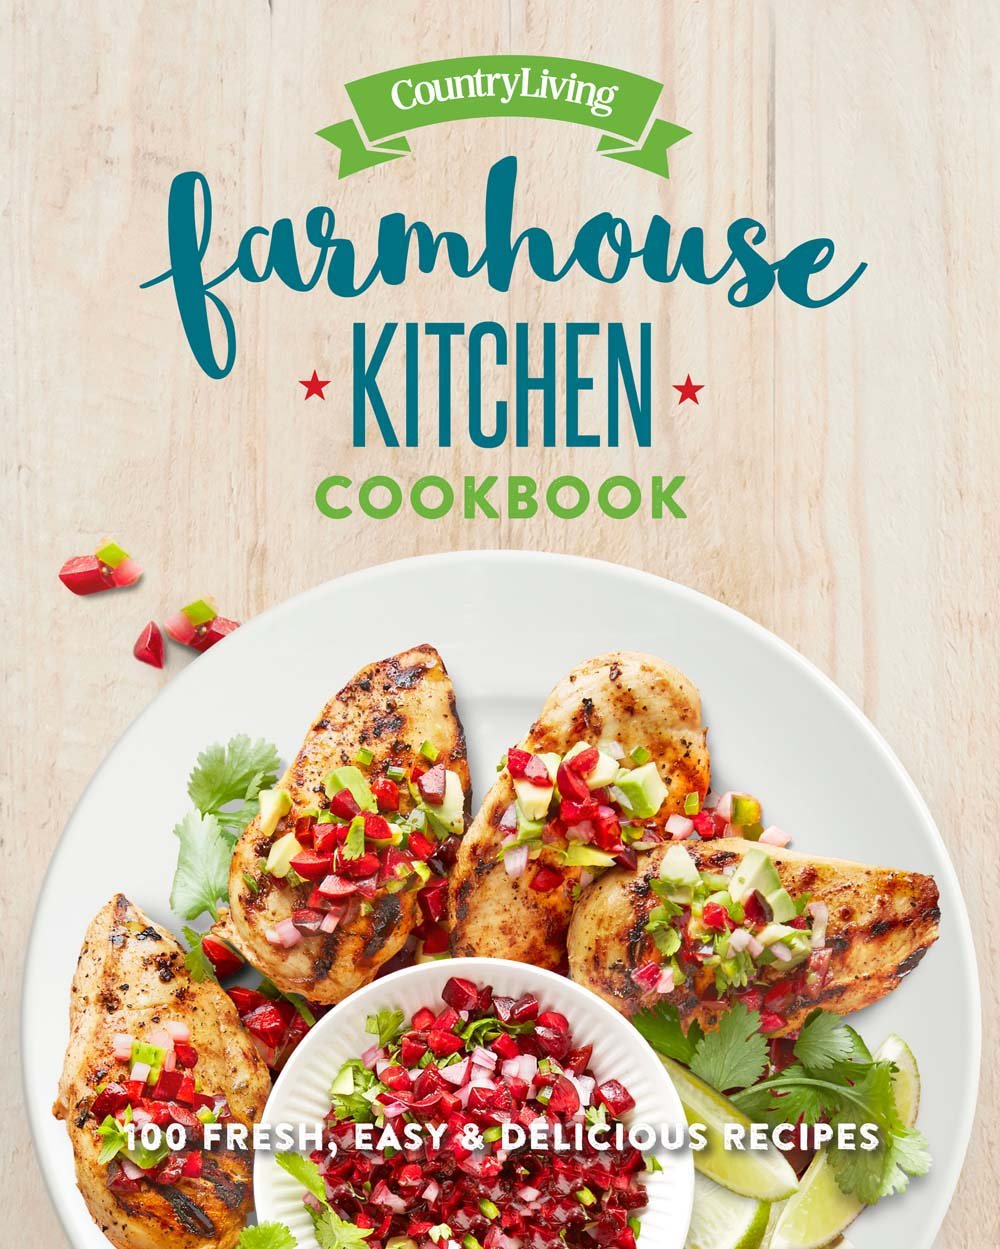 Country Living Farmhouse Kitchen Cookbook: 100 Fresh, Easy & Delicious Recipes ebook